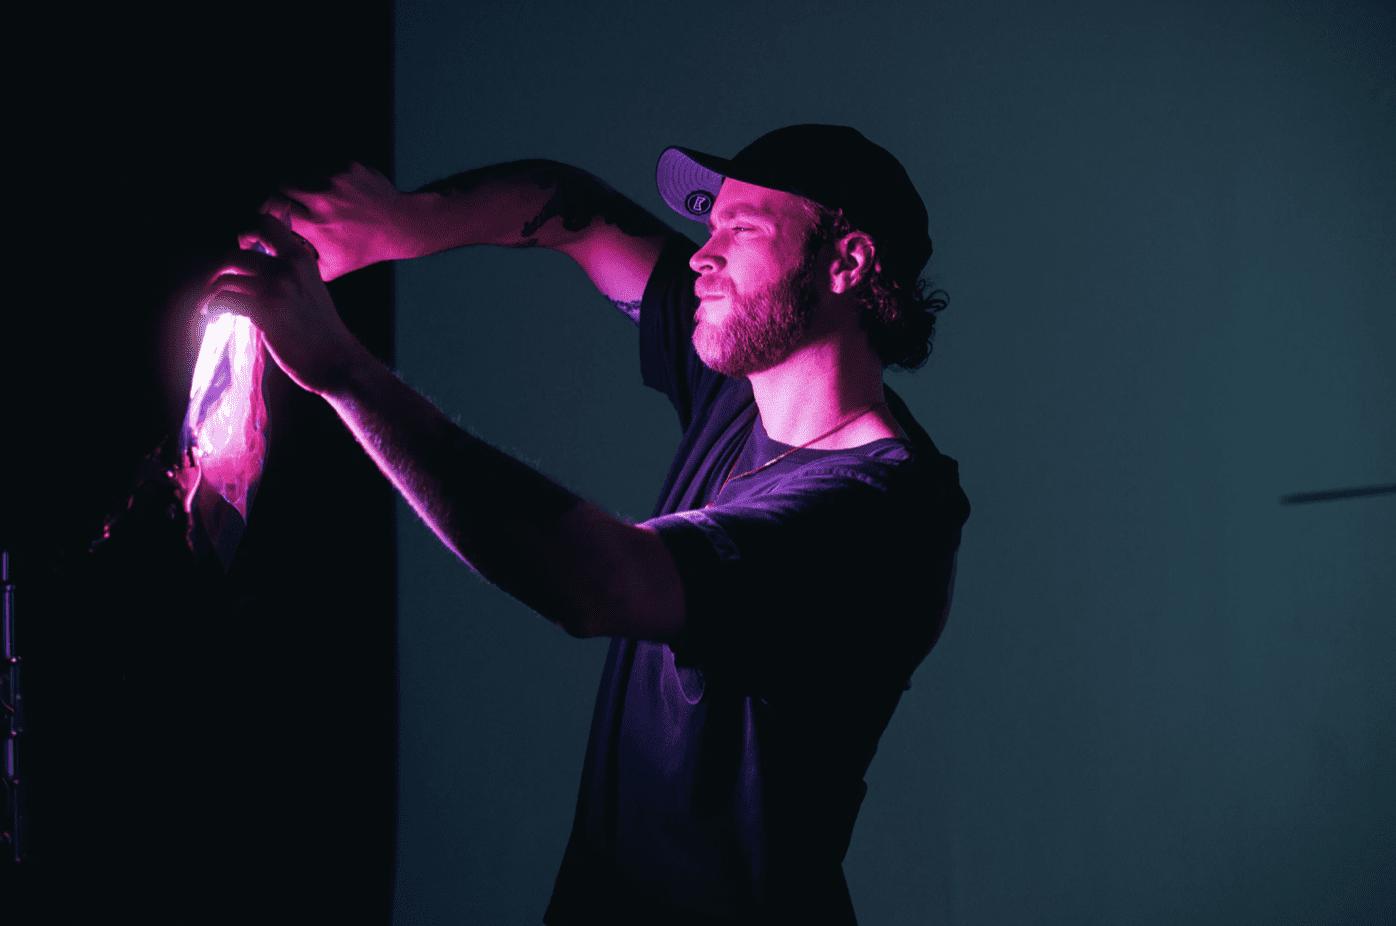 man creating visual content